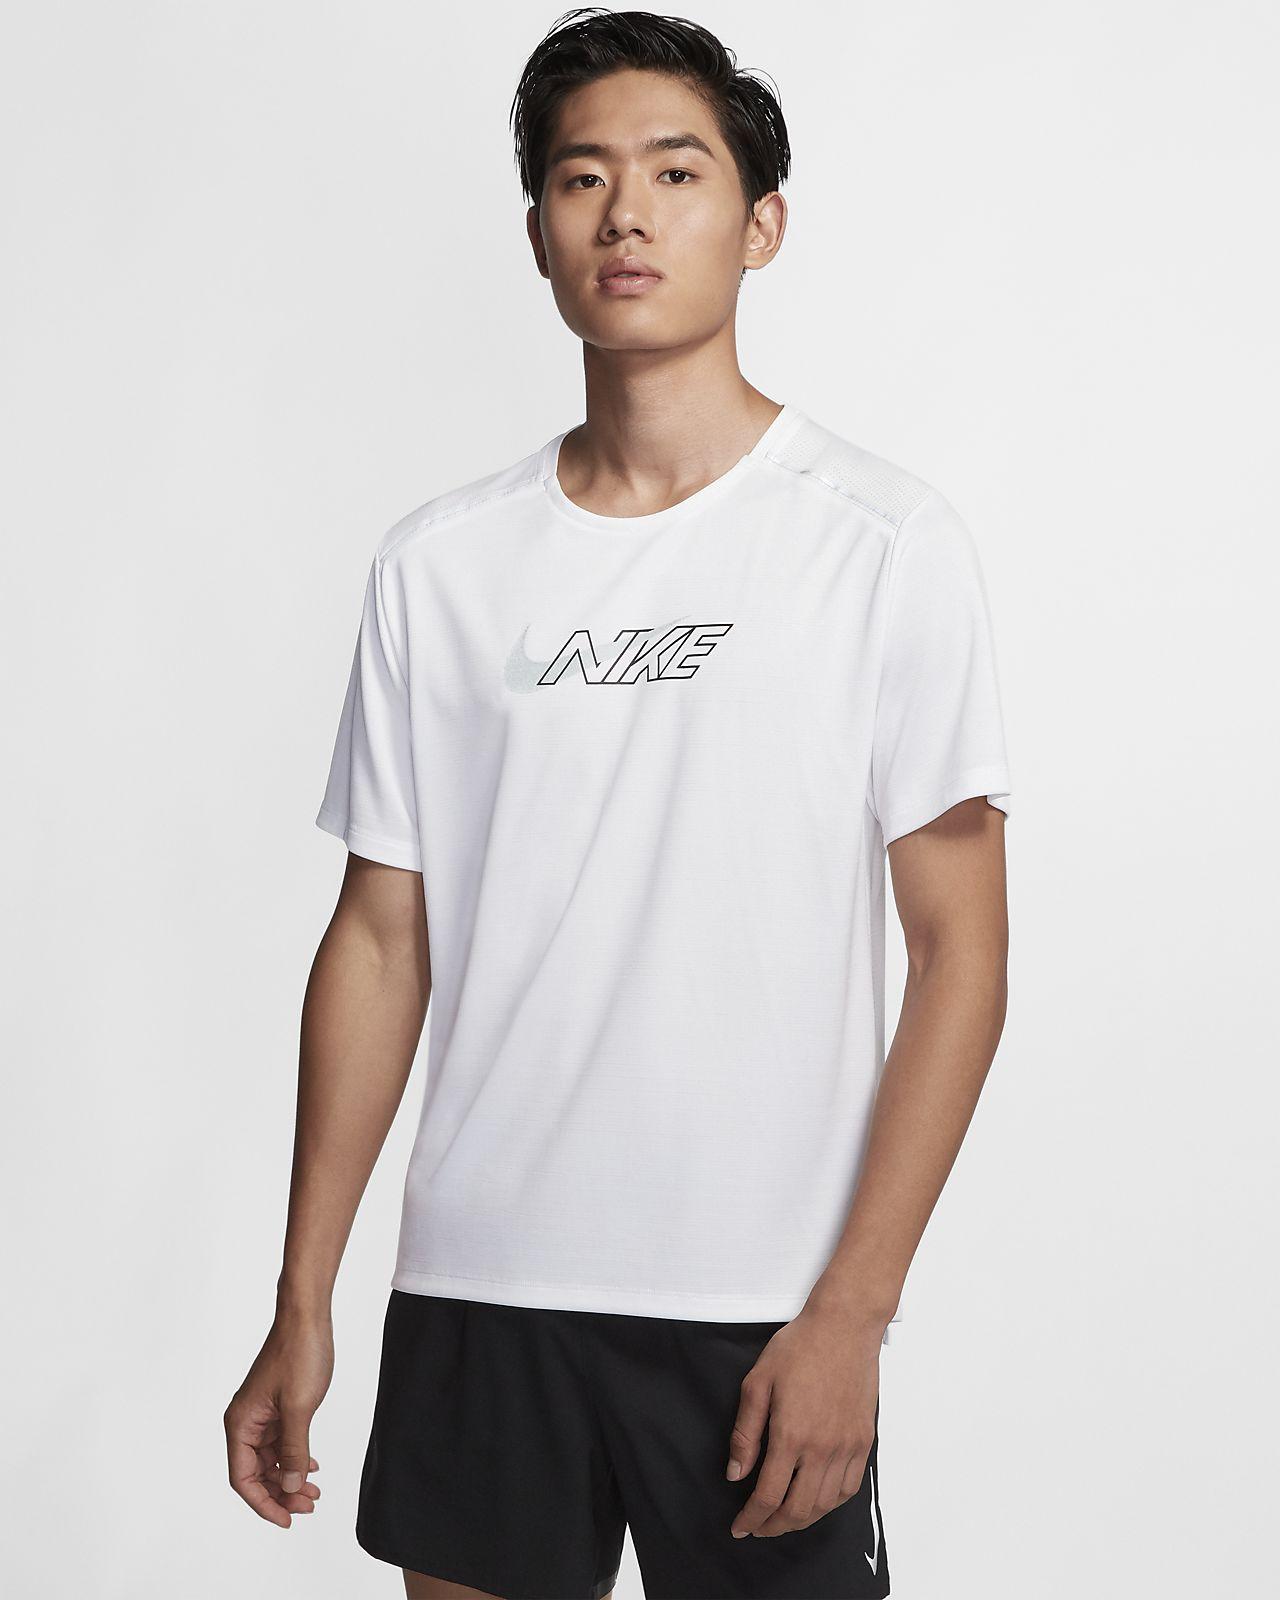 Nike Dri-FIT Miler Flash 男子短袖跑步上衣